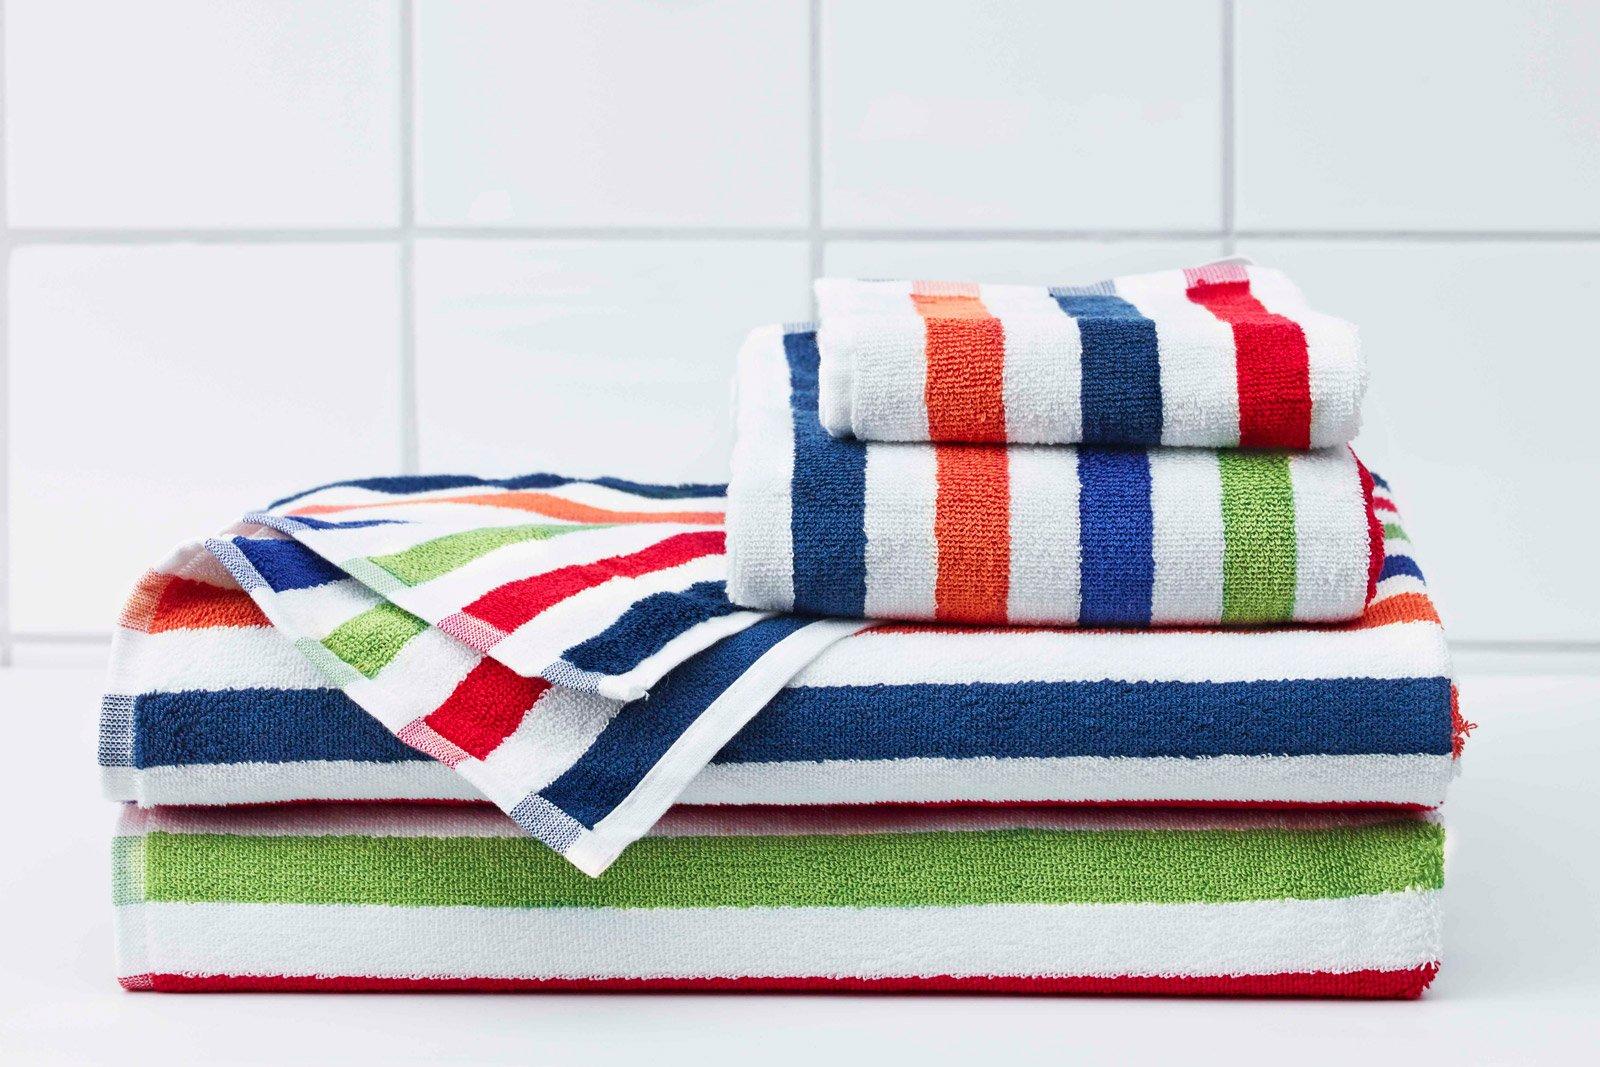 Ikea rubinetteria bagno for Rubinetti ikea bagno